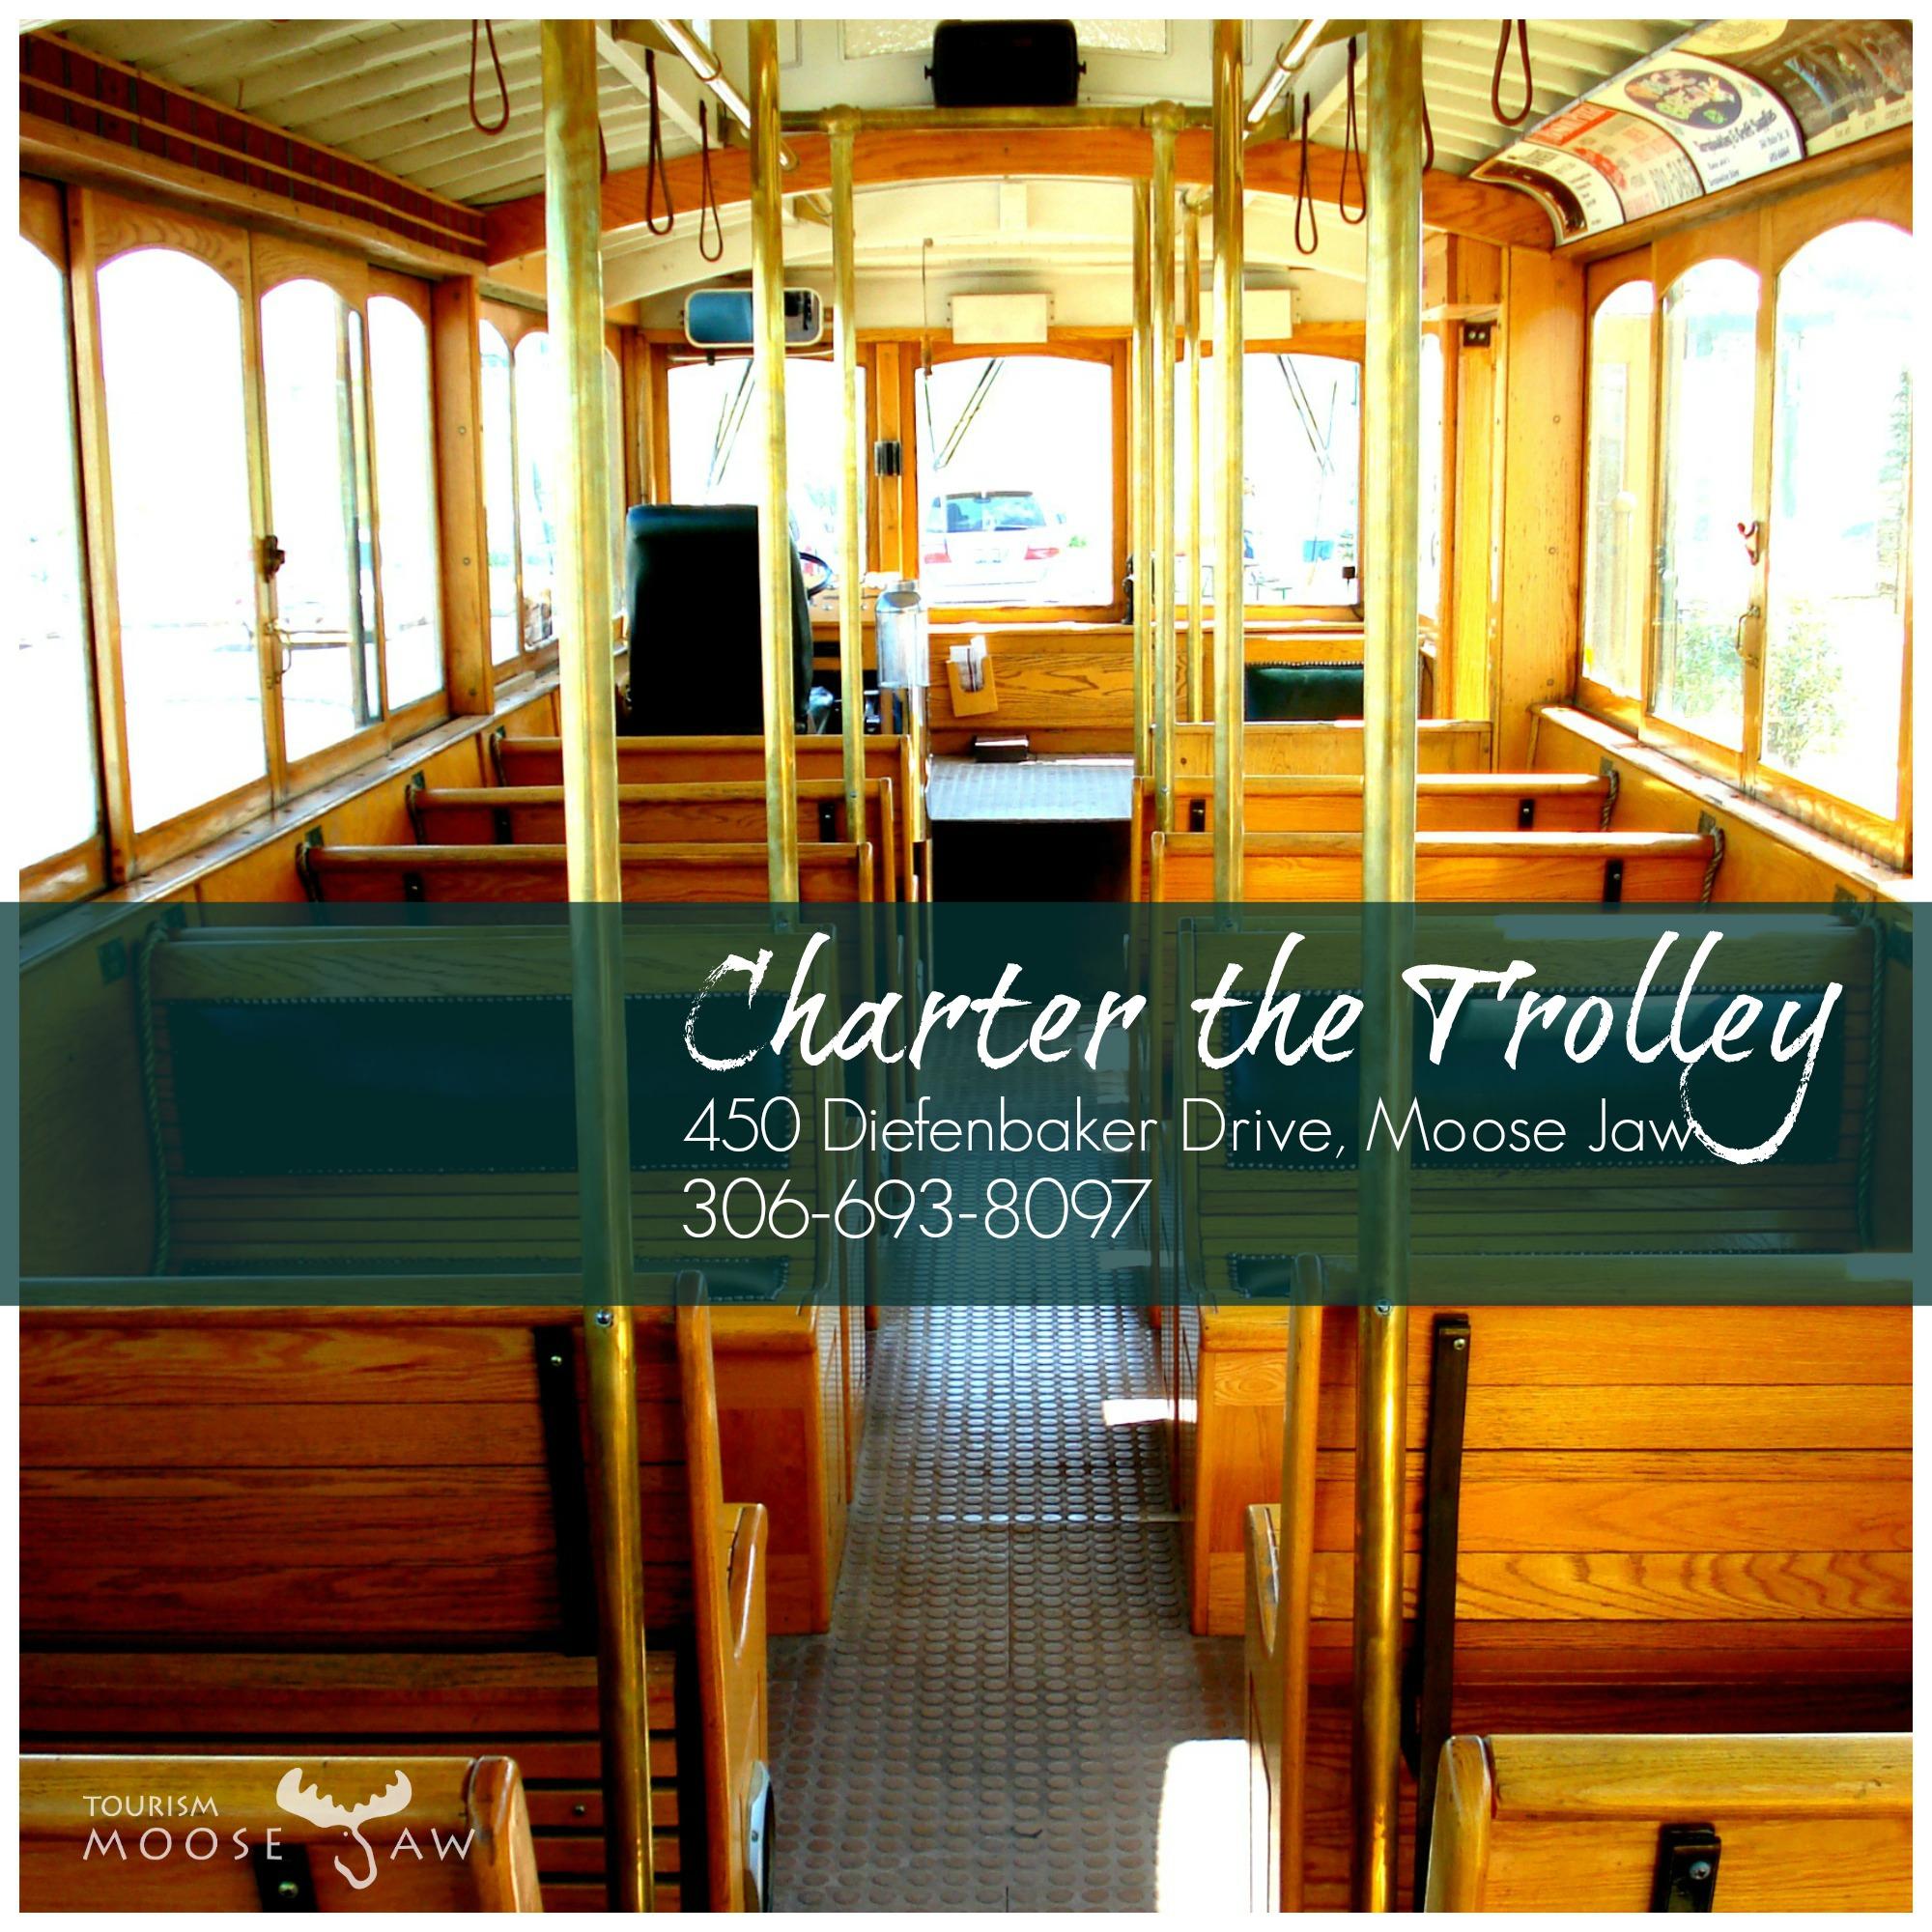 inside trolley - with border - website.jpg